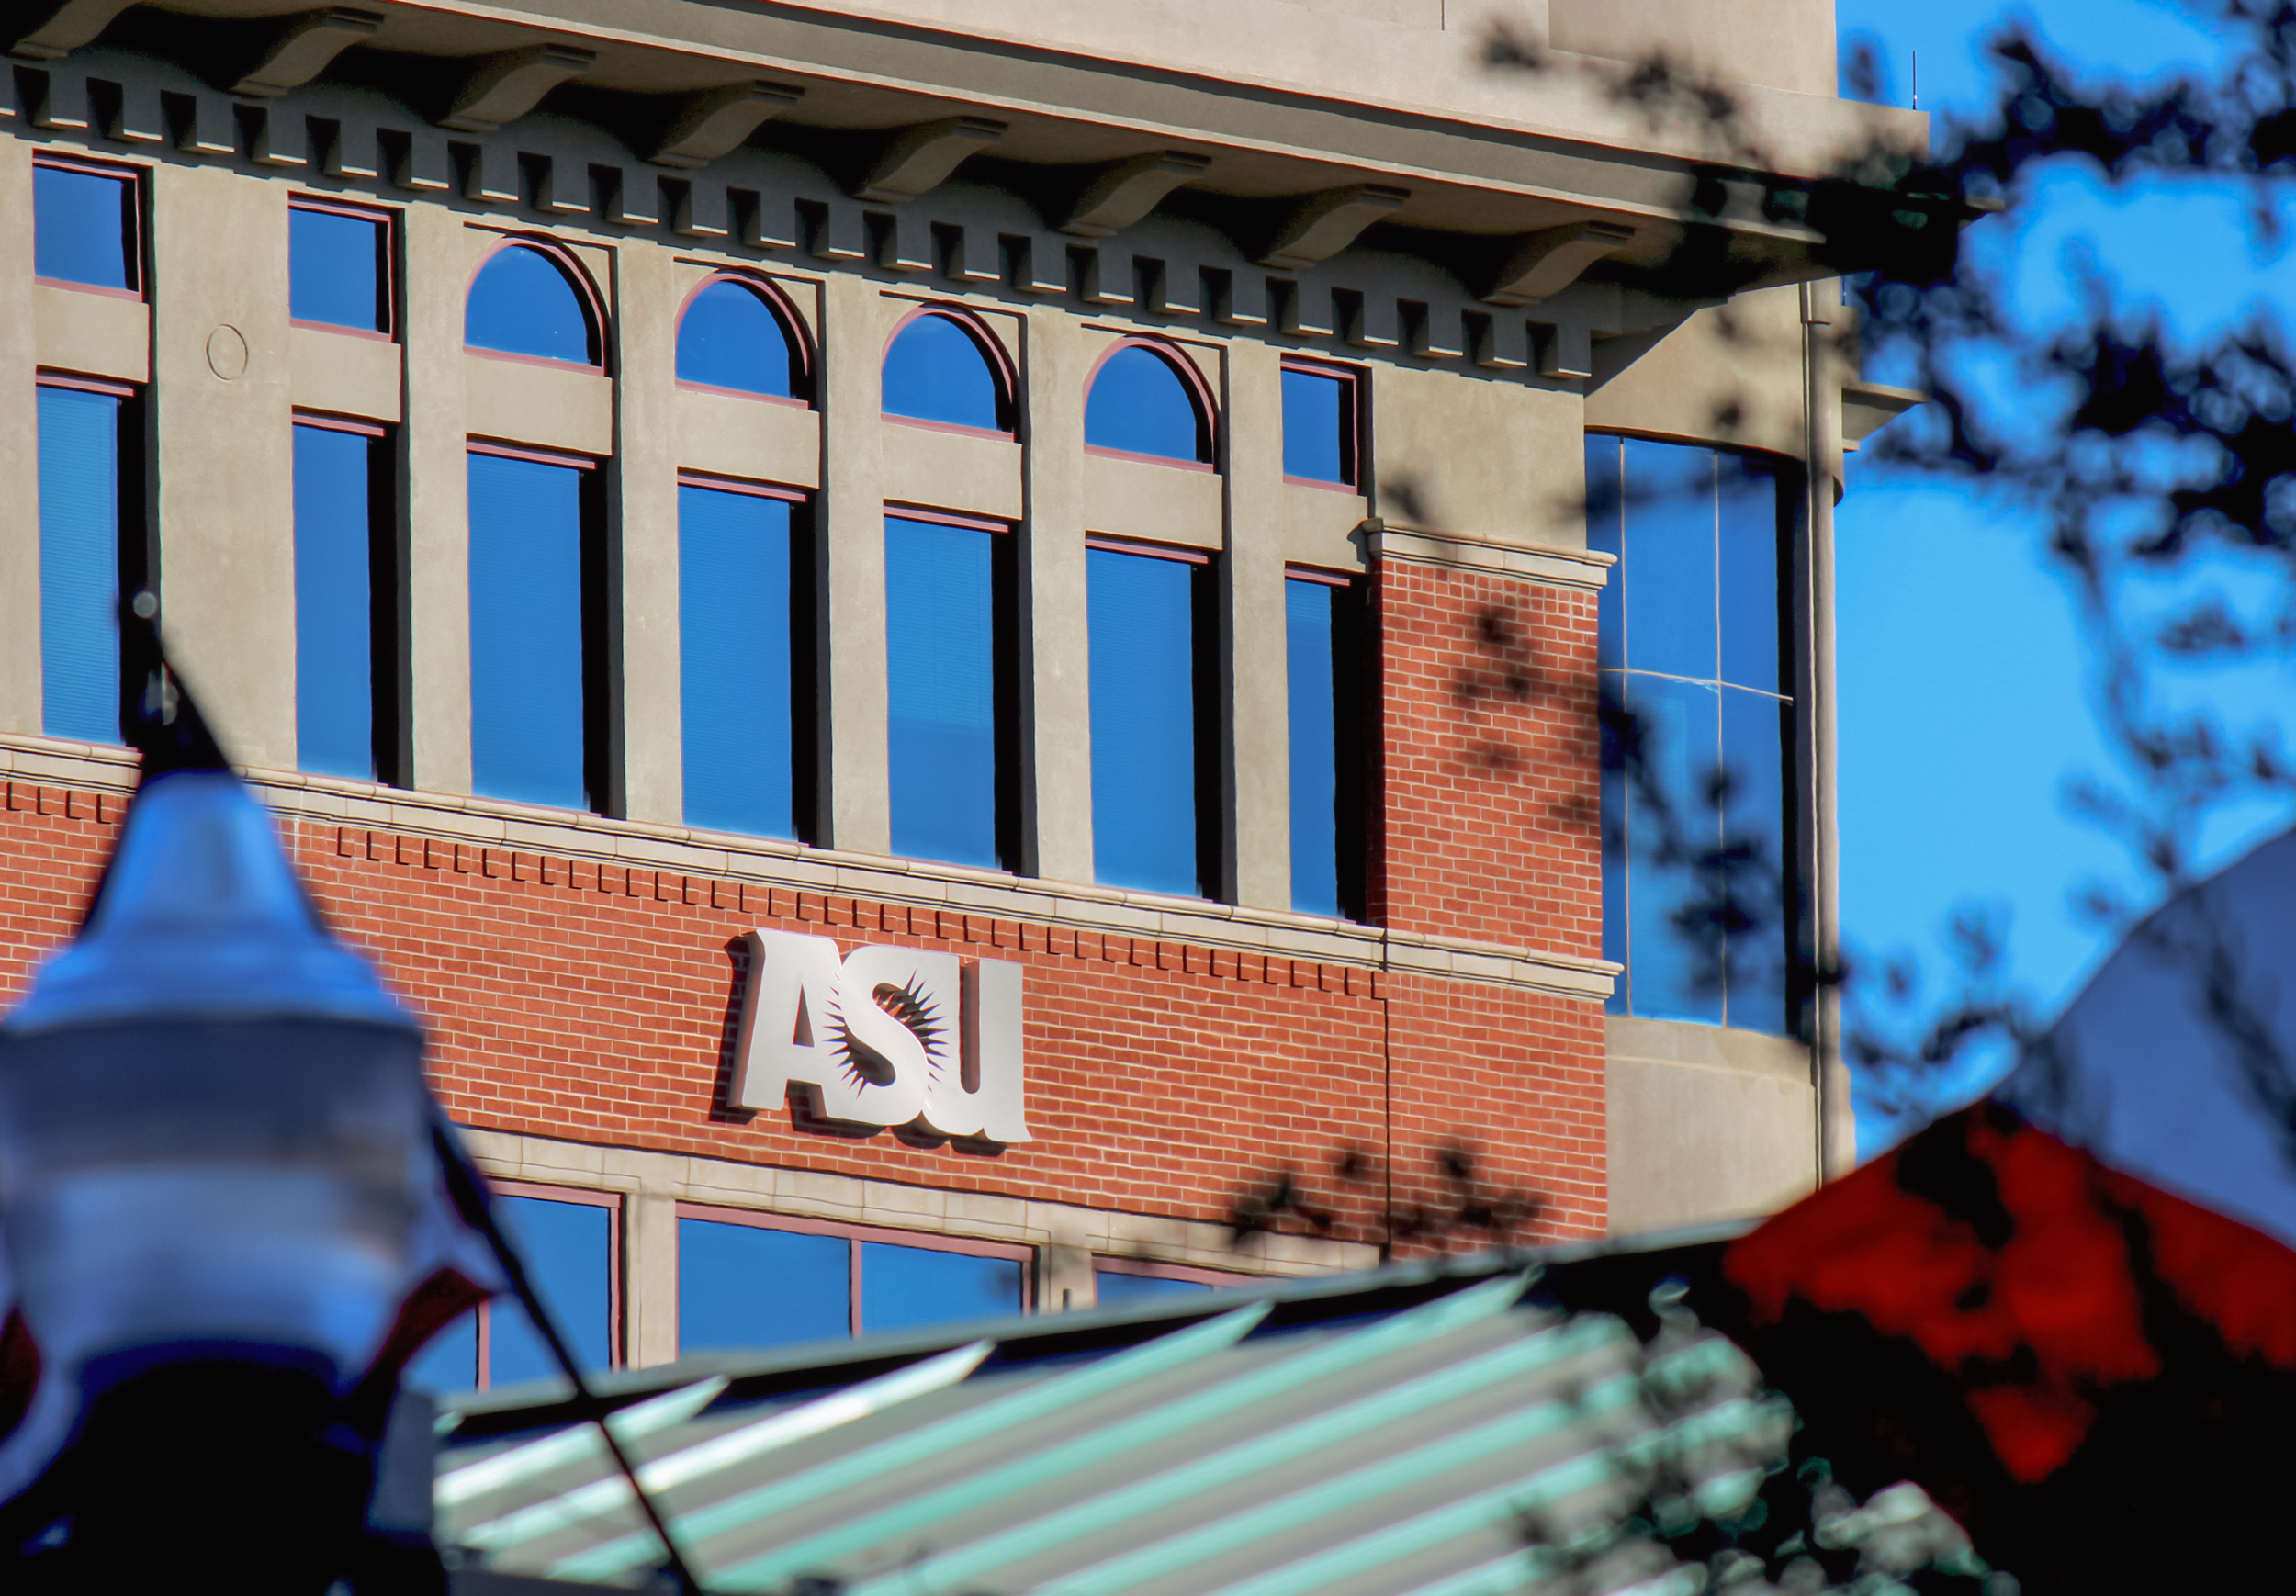 A custom designed ASU logo with perforated returns and LED illumination.